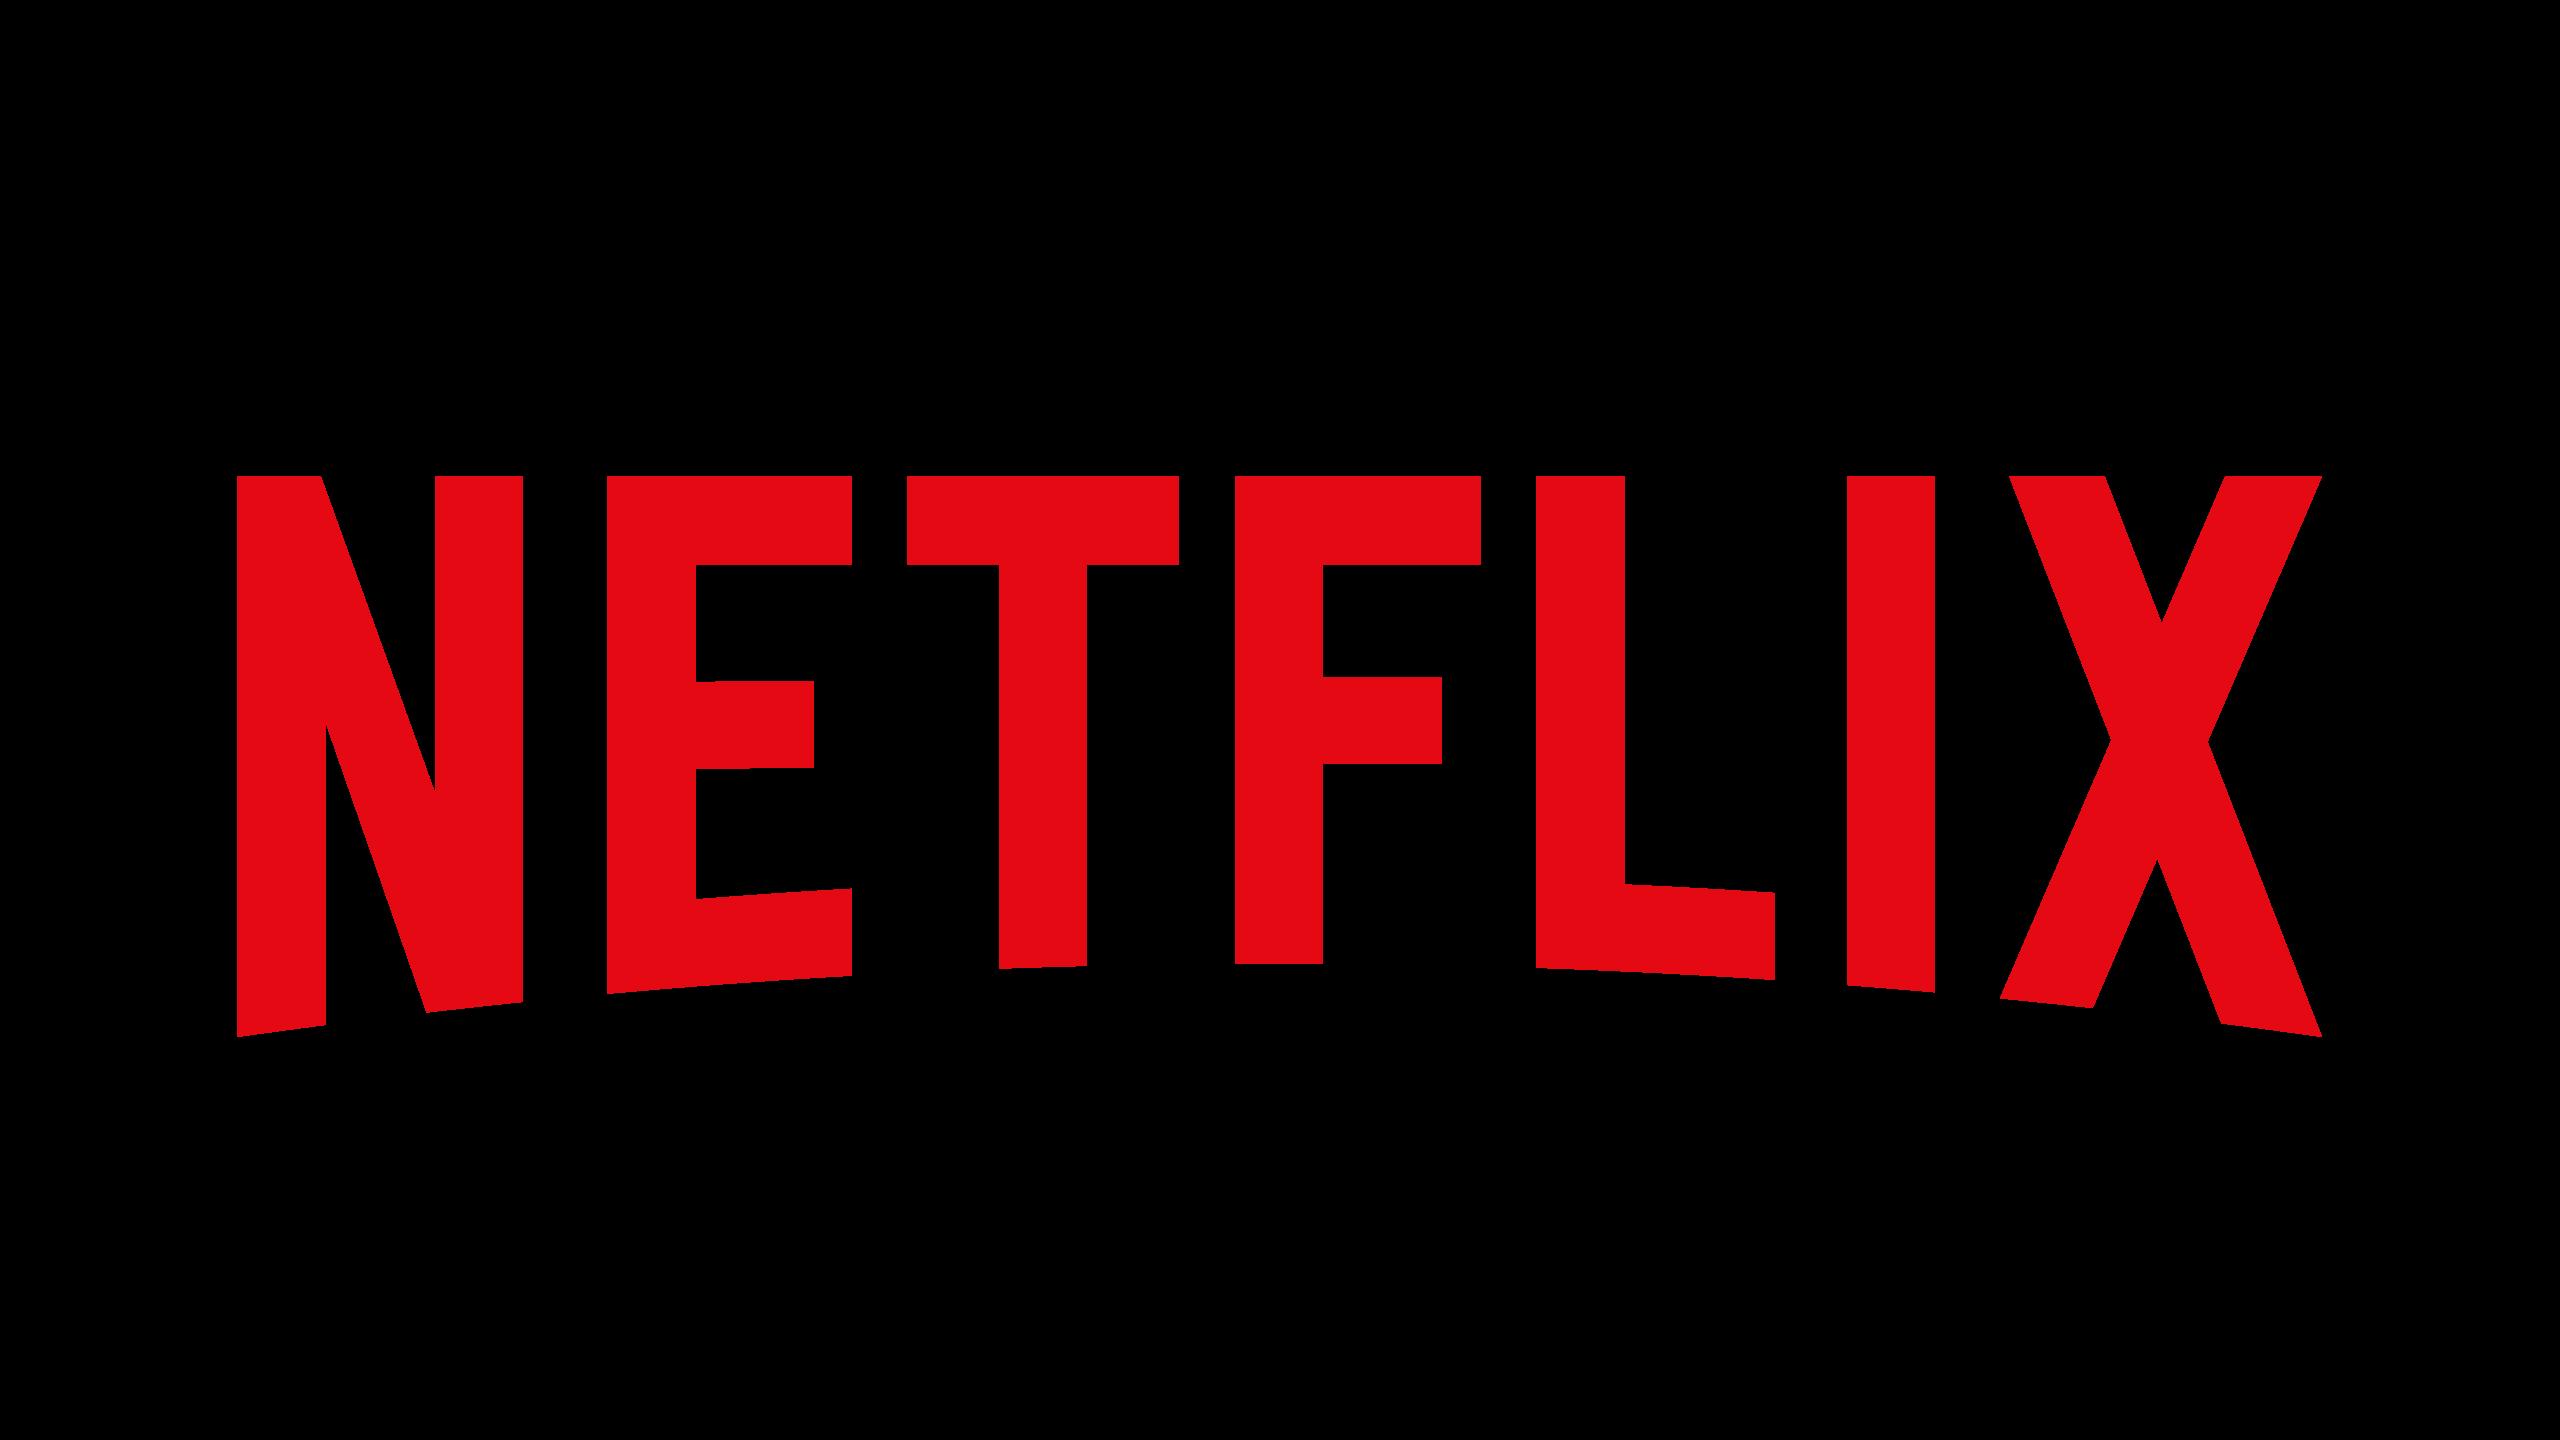 Netflix.com Image